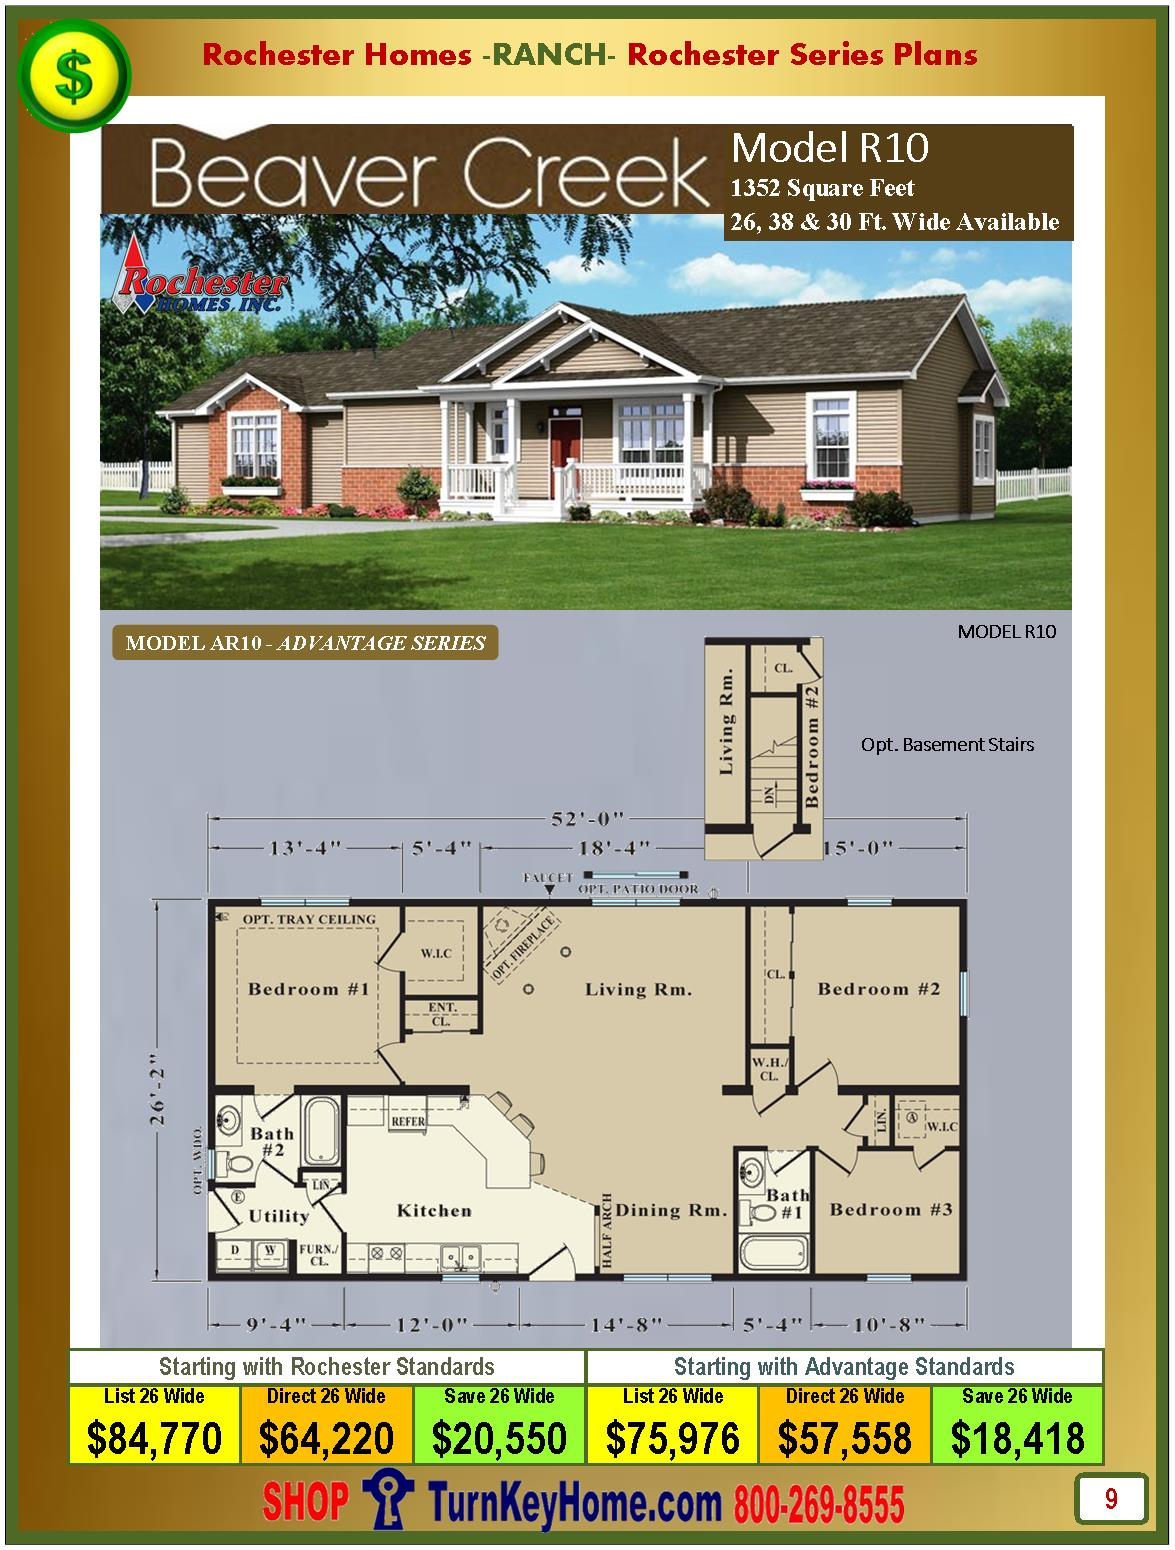 Modular.Homes.Rochester.Home.Inc.Beaver.Creek.R10.Ranch.Plan.Price.Catalog.P9.1215